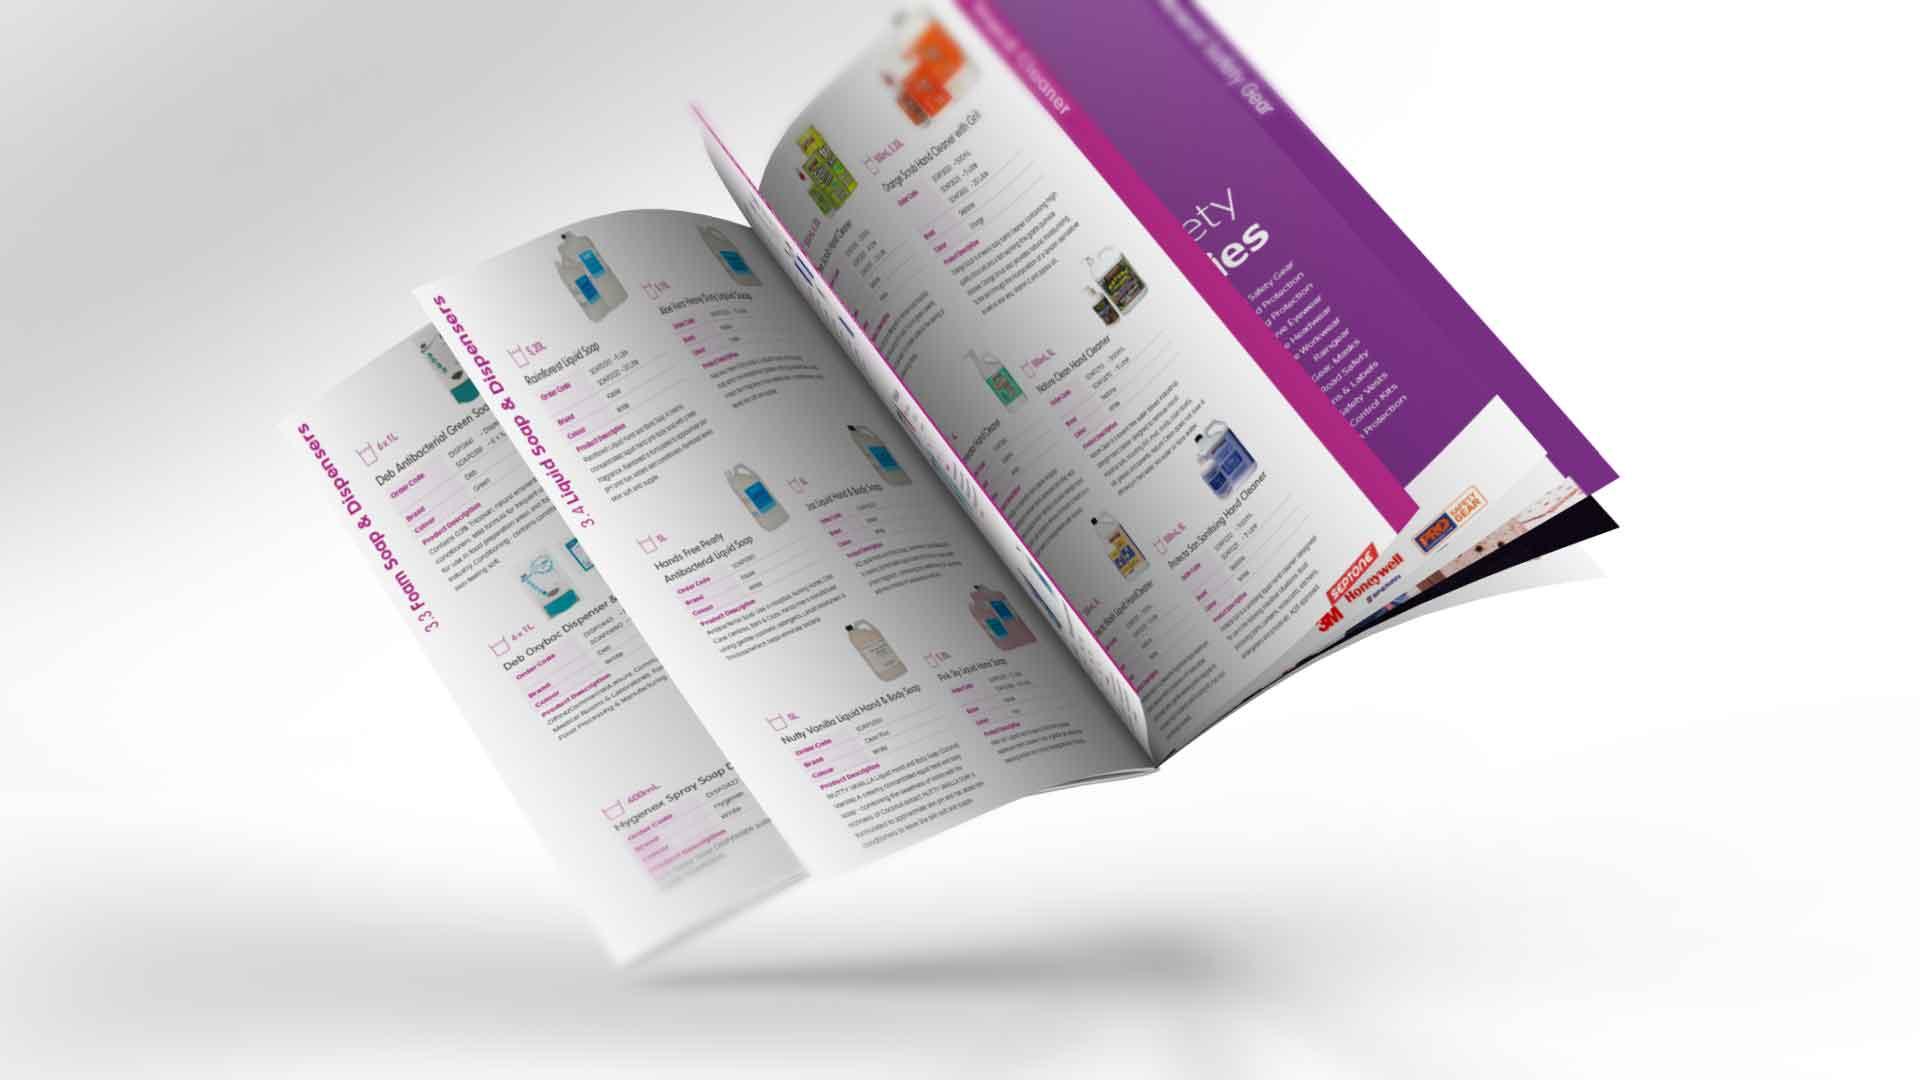 New york city catalogue design company vsl print for New york city design company